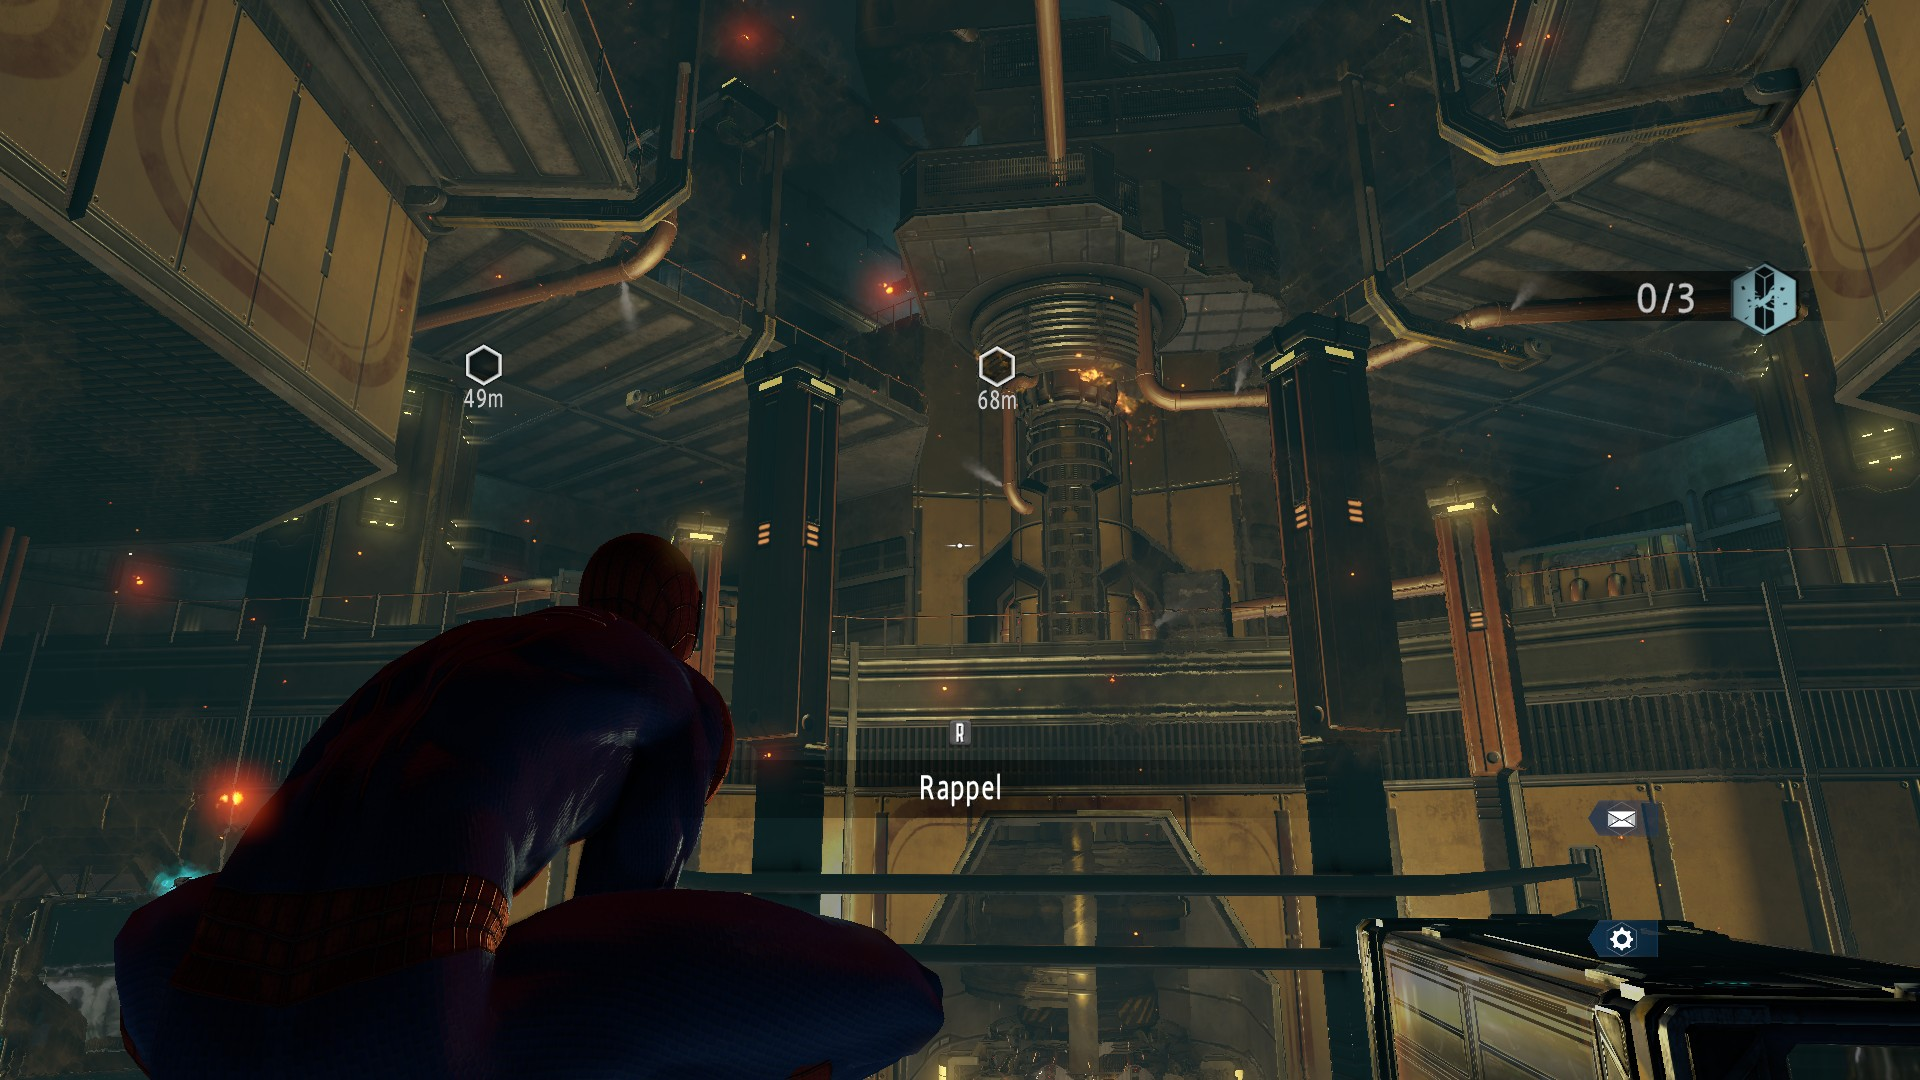 The Amazing Spider-Man 2 - PC Performance Analysis - DSOGaming